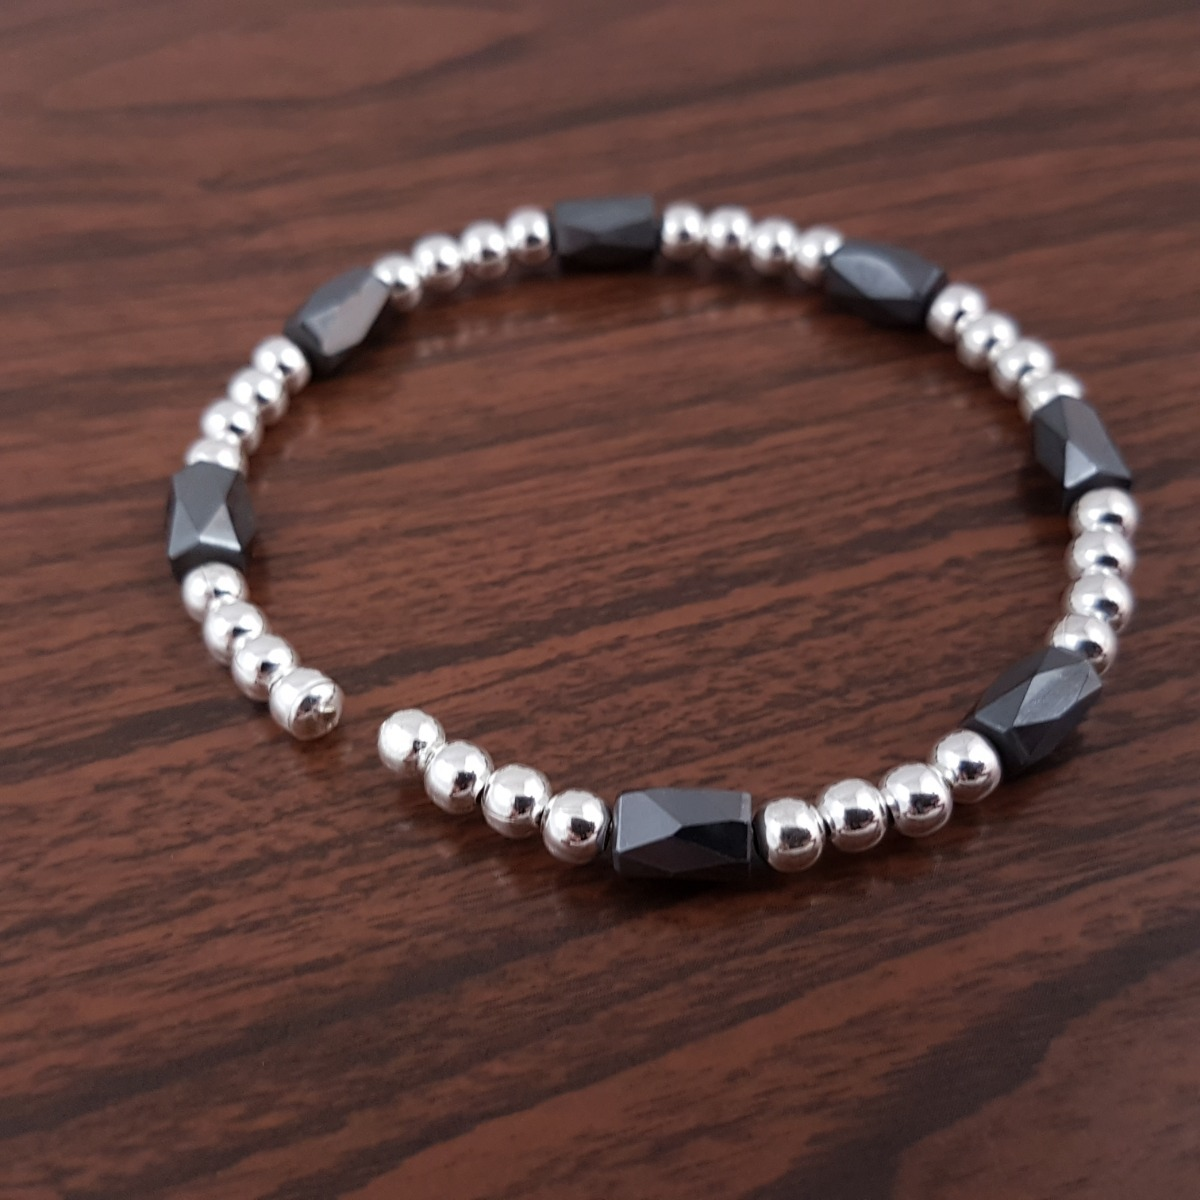 127bb3608549 esclavas flexible de plata italiana 925 con piedra imán. Cargando zoom.